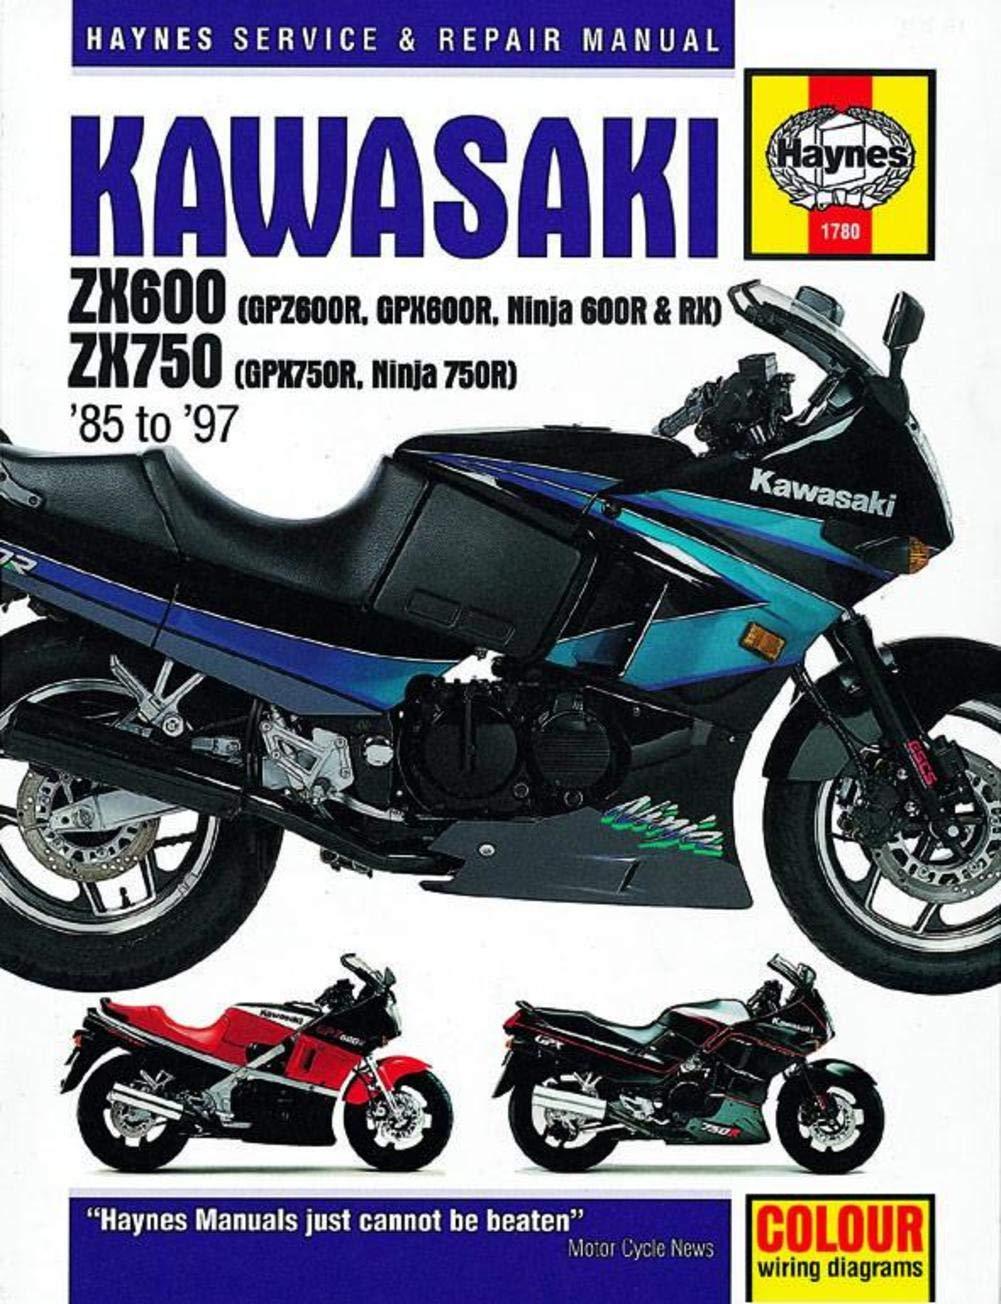 91 94 Kawasaki Zx7r Haynes Repair Manual Automotive Zx7 Wiring Diagram